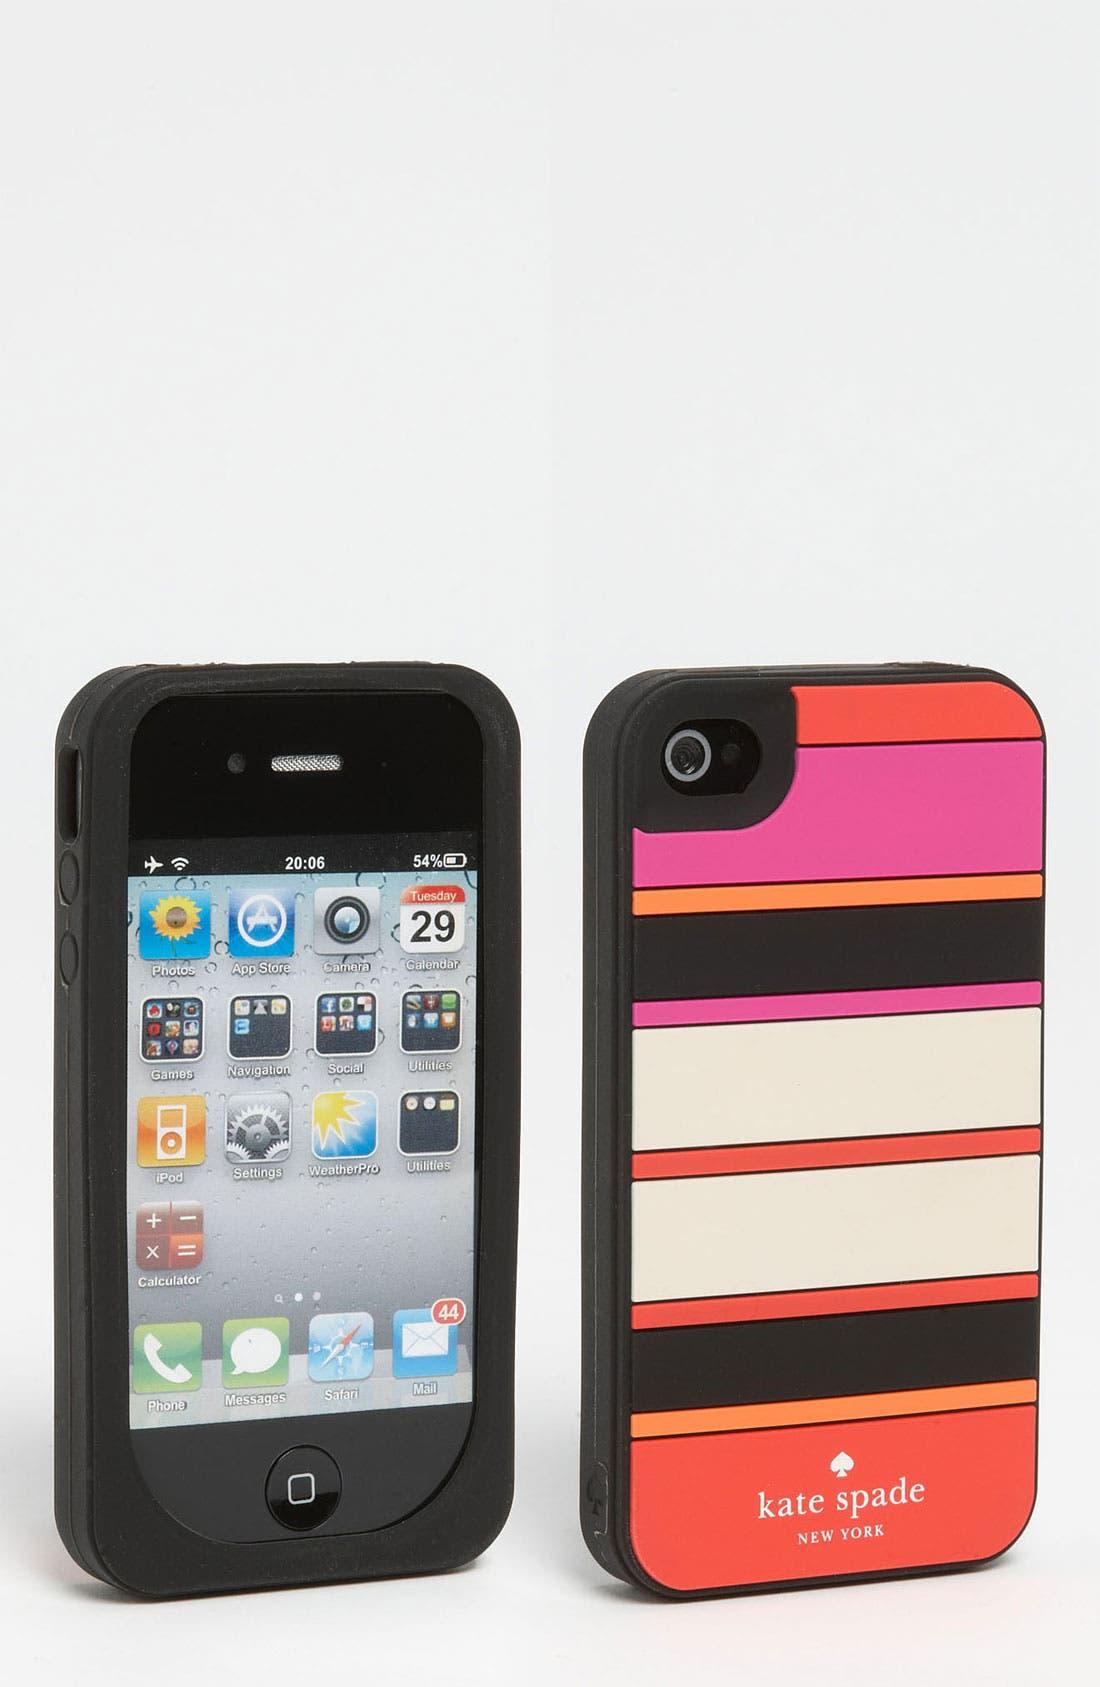 Main Image - kate spade new york 'kaleidoscope stripe' iPhone 4 & 4S case